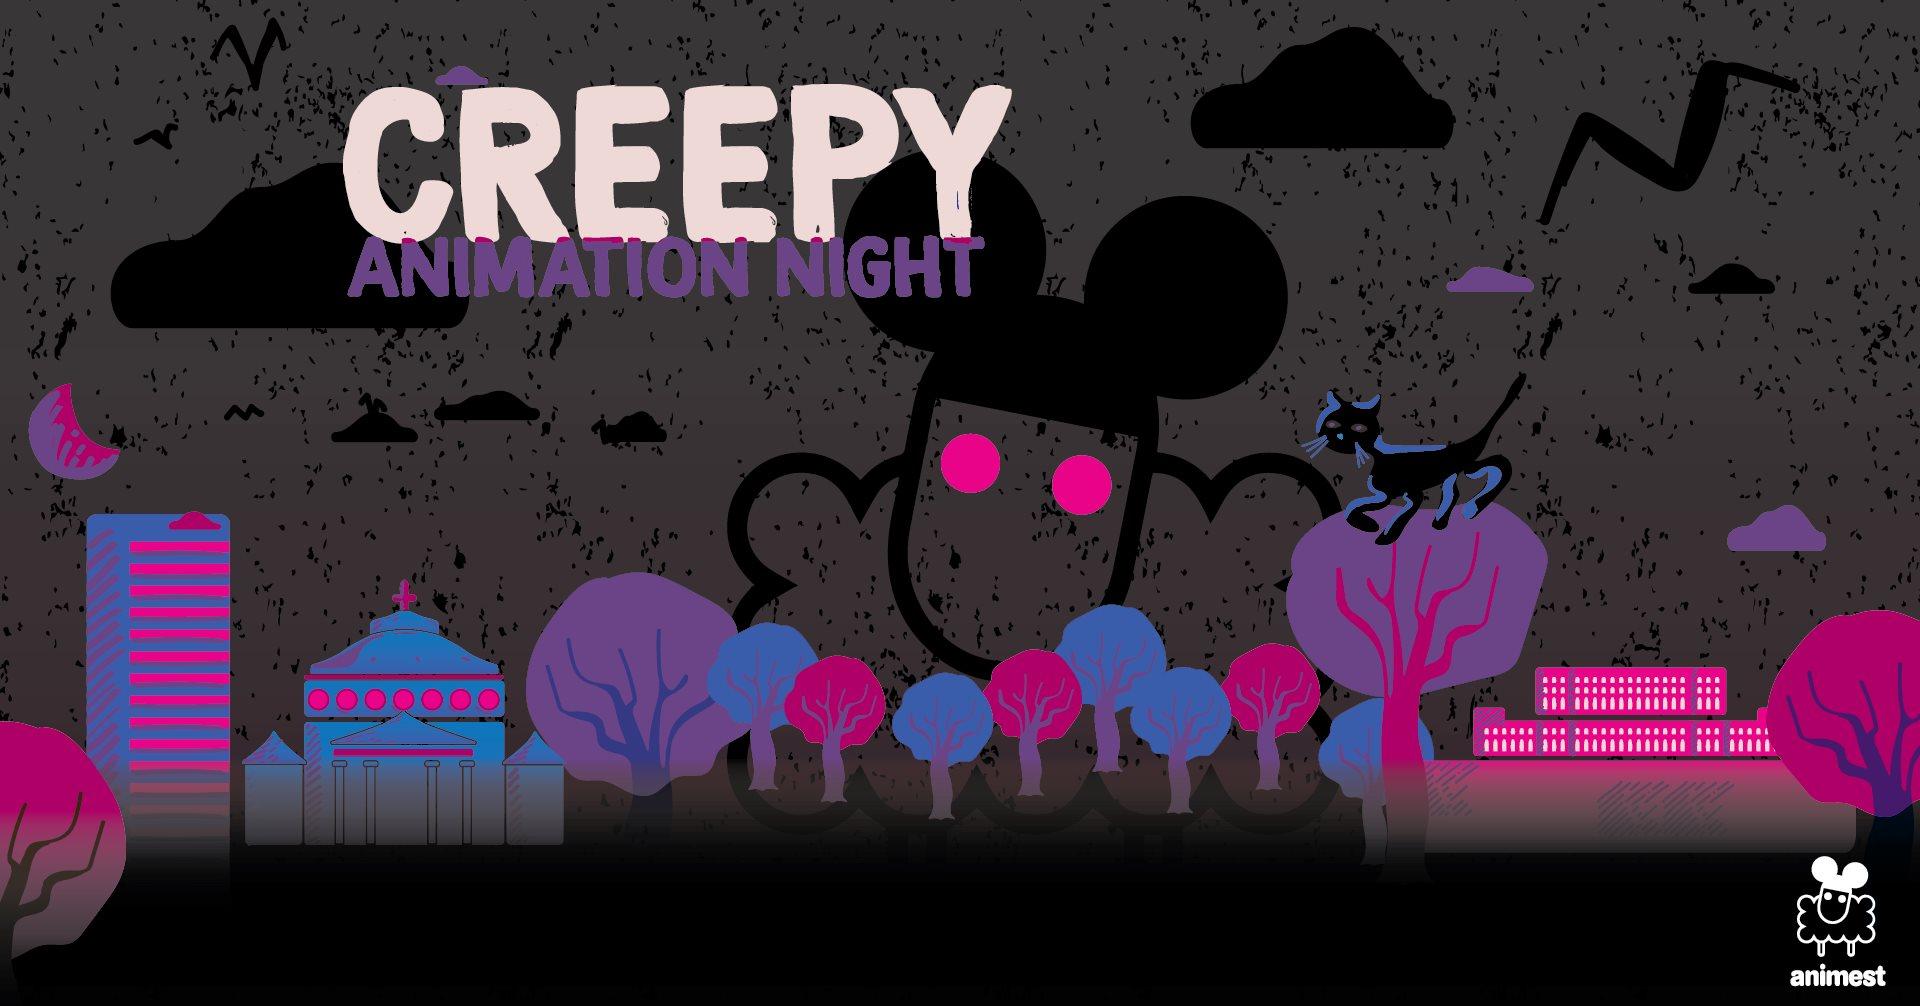 Creepy Animation Night by Animest